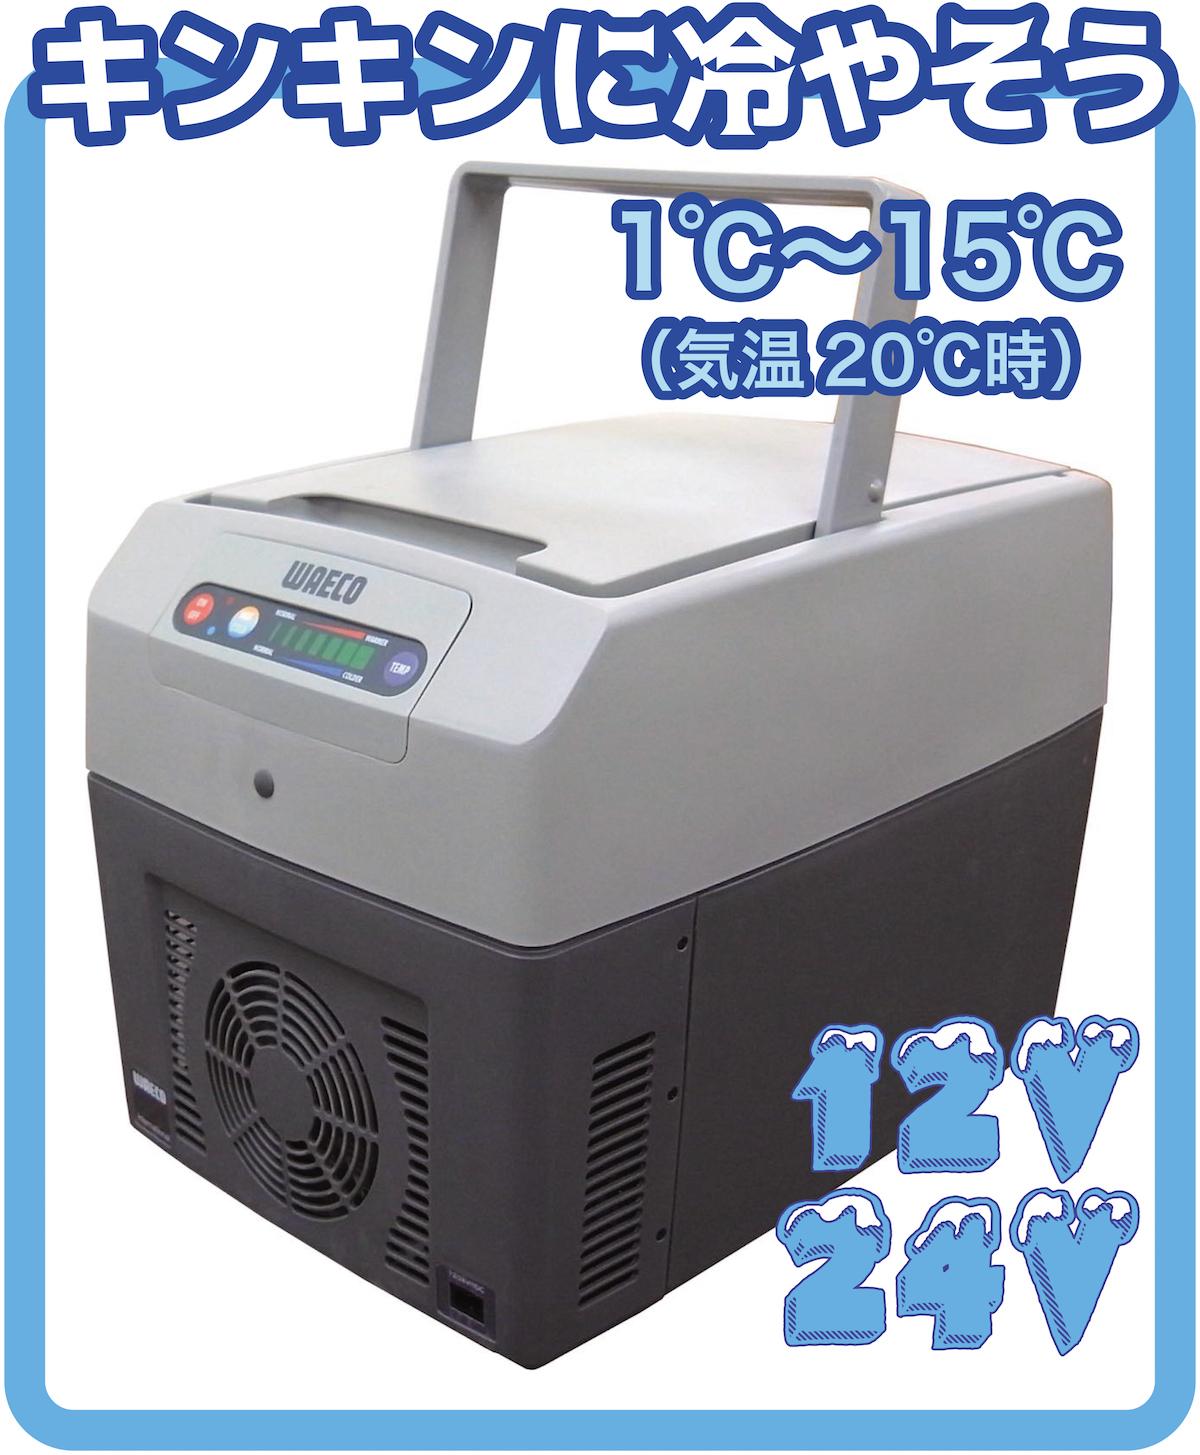 TC14FL 温冷蔵庫 【車載OK温冷庫】